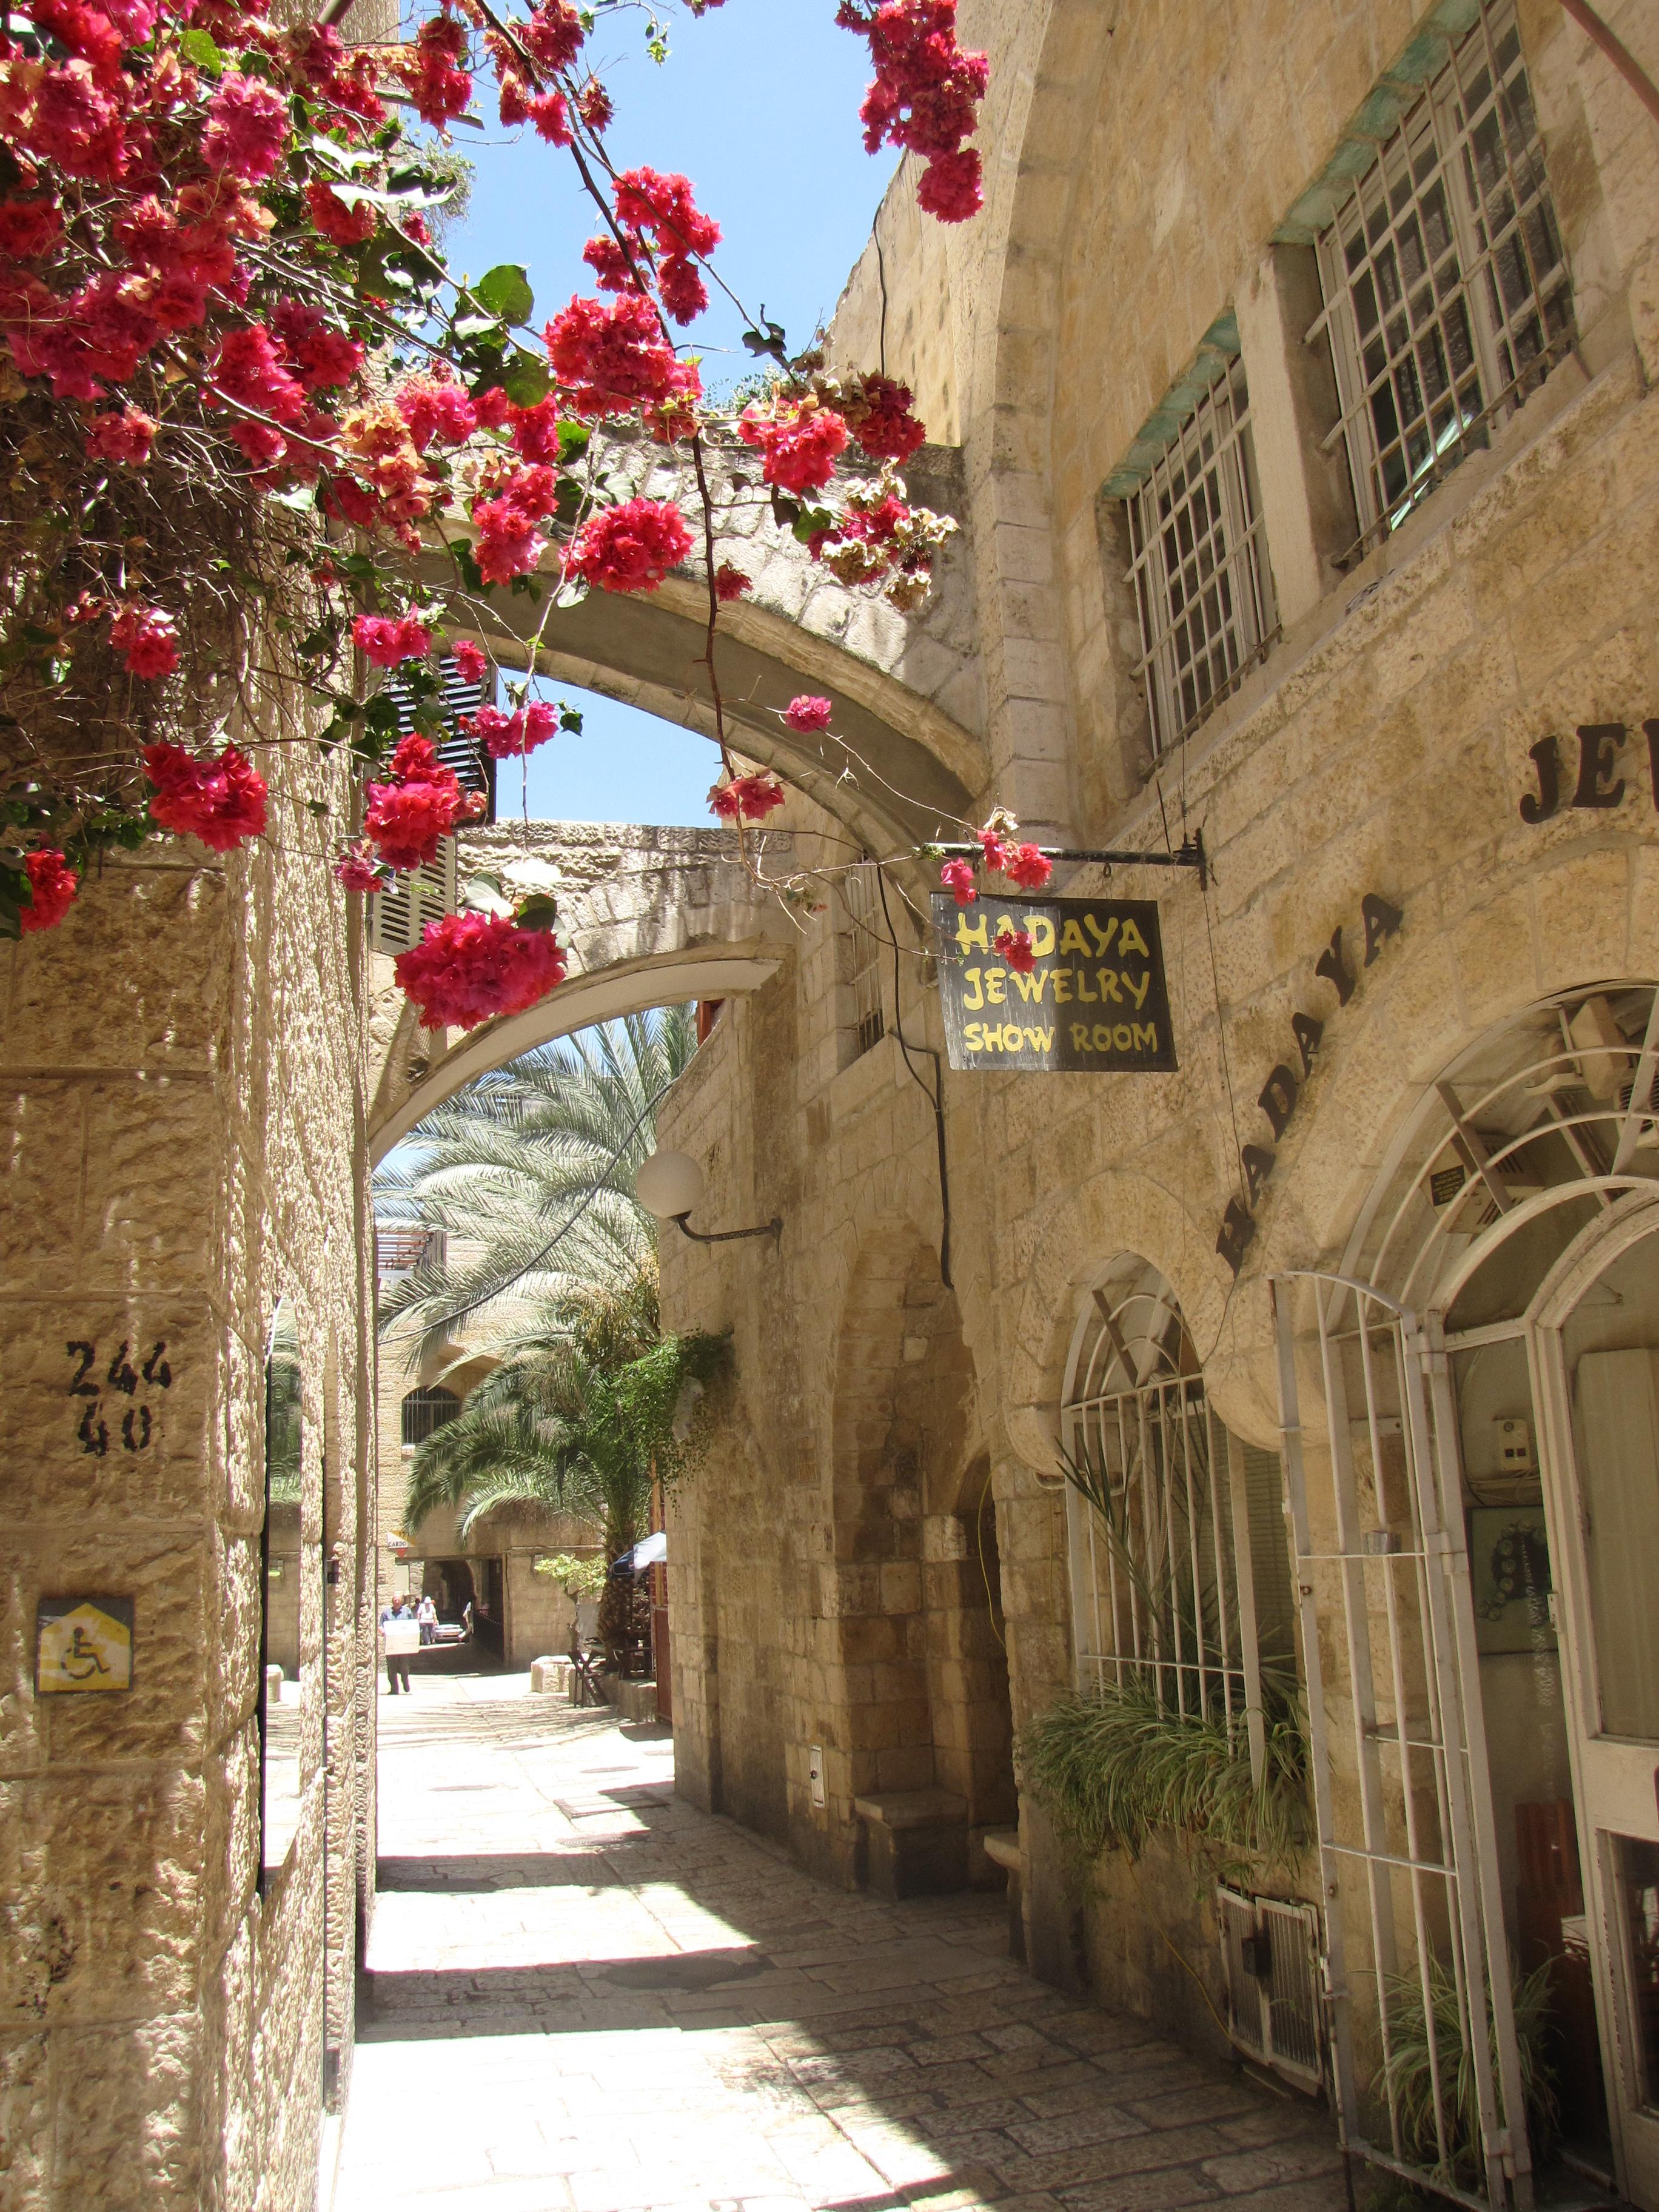 Old_Jerusalem,_Jewish_Quarter_road,_Hadaya_Jewelry_2009